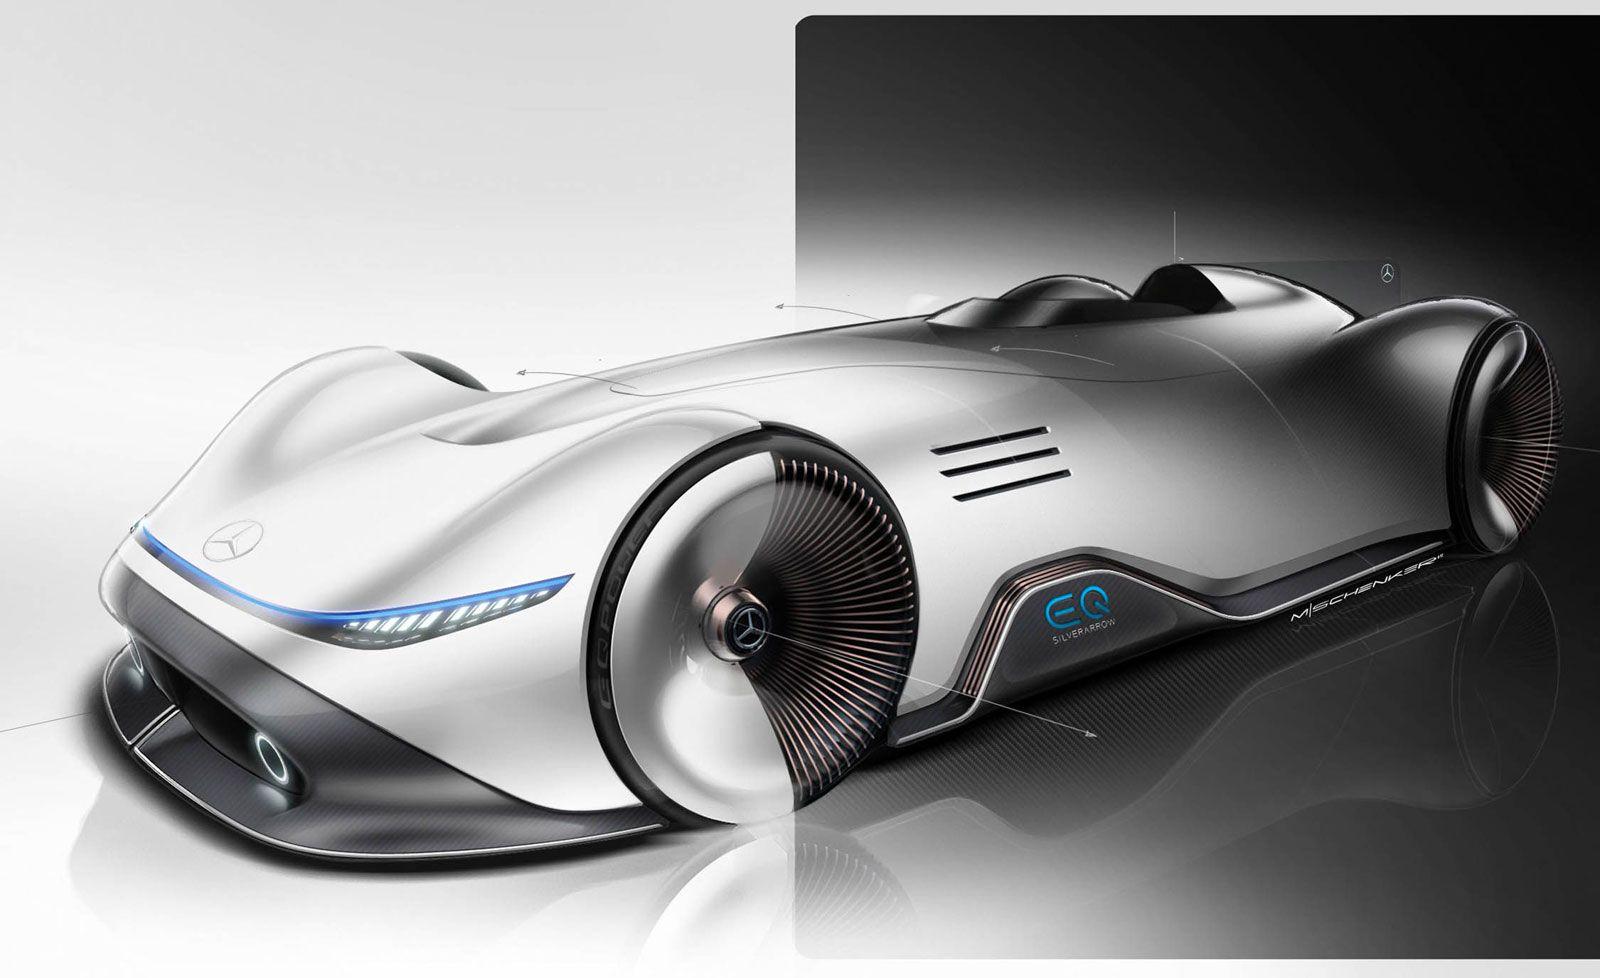 Mercedes Benz Vision Eq Silver Arrow Concept Design Sketch Render Concept Car Design Concept Cars Car Design